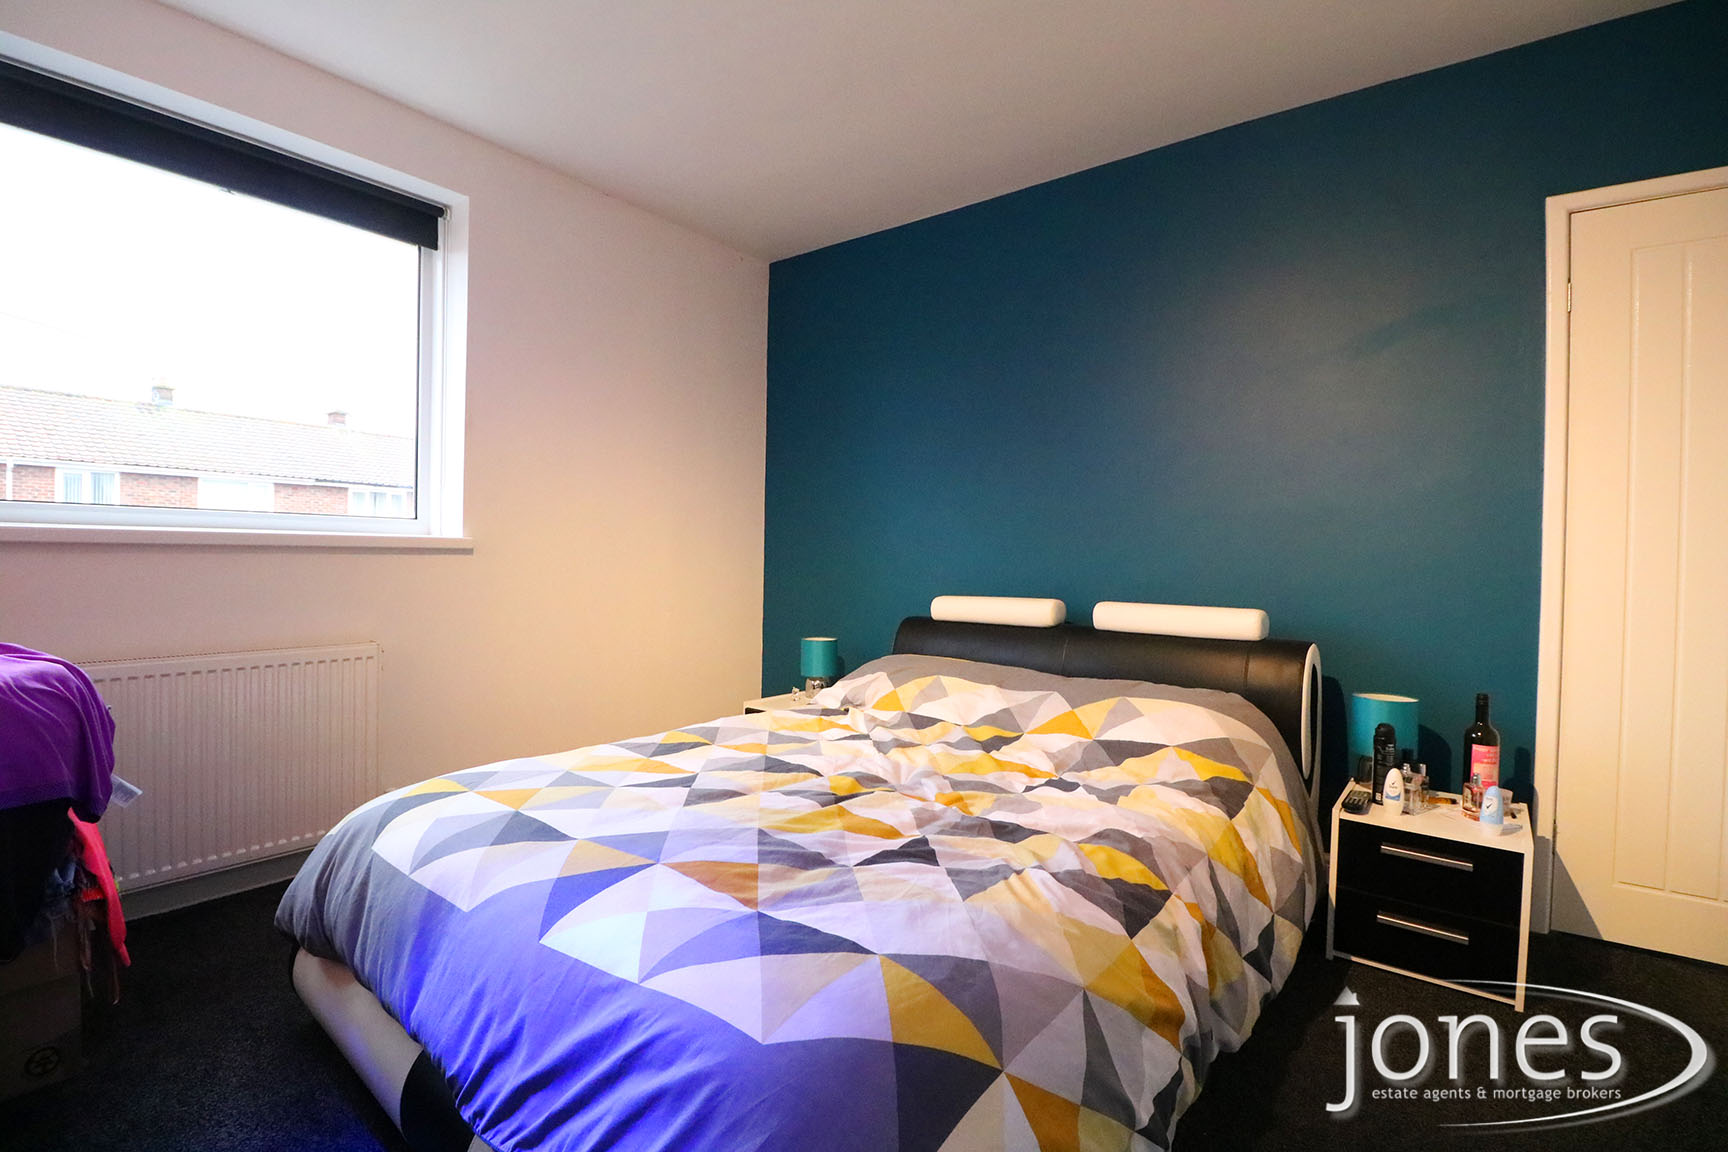 Home for Sale Let - Photo 07 Feetham Avenue, Darlington, DL1 2DY